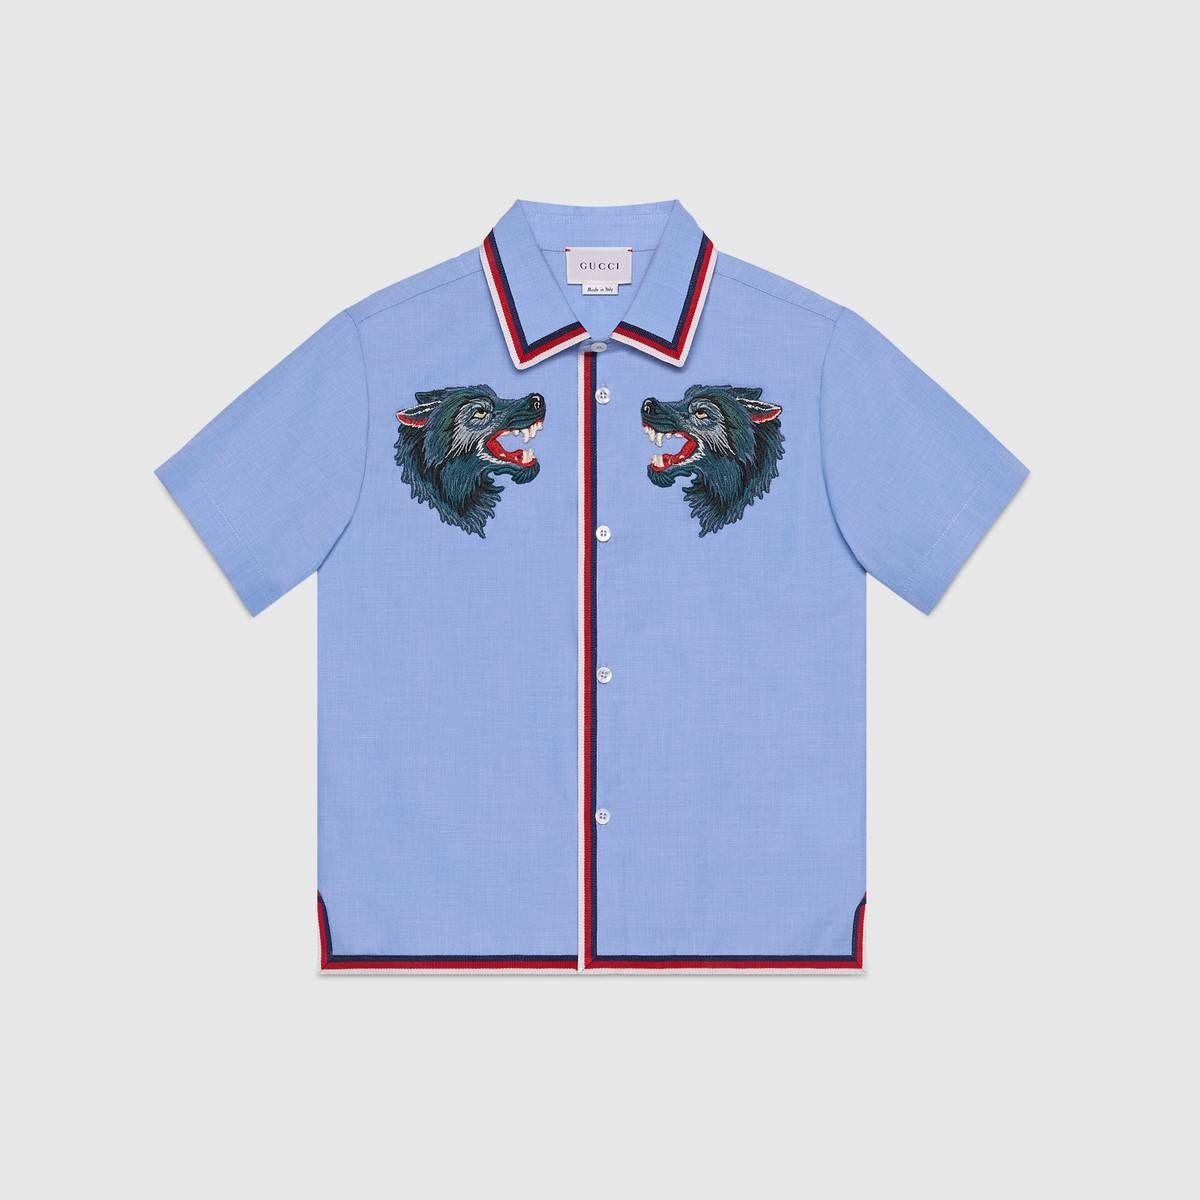 0b2dc0d2b3a Children s cotton shirt with wolves - Gucci Boys  Shirts 499993XBD344307